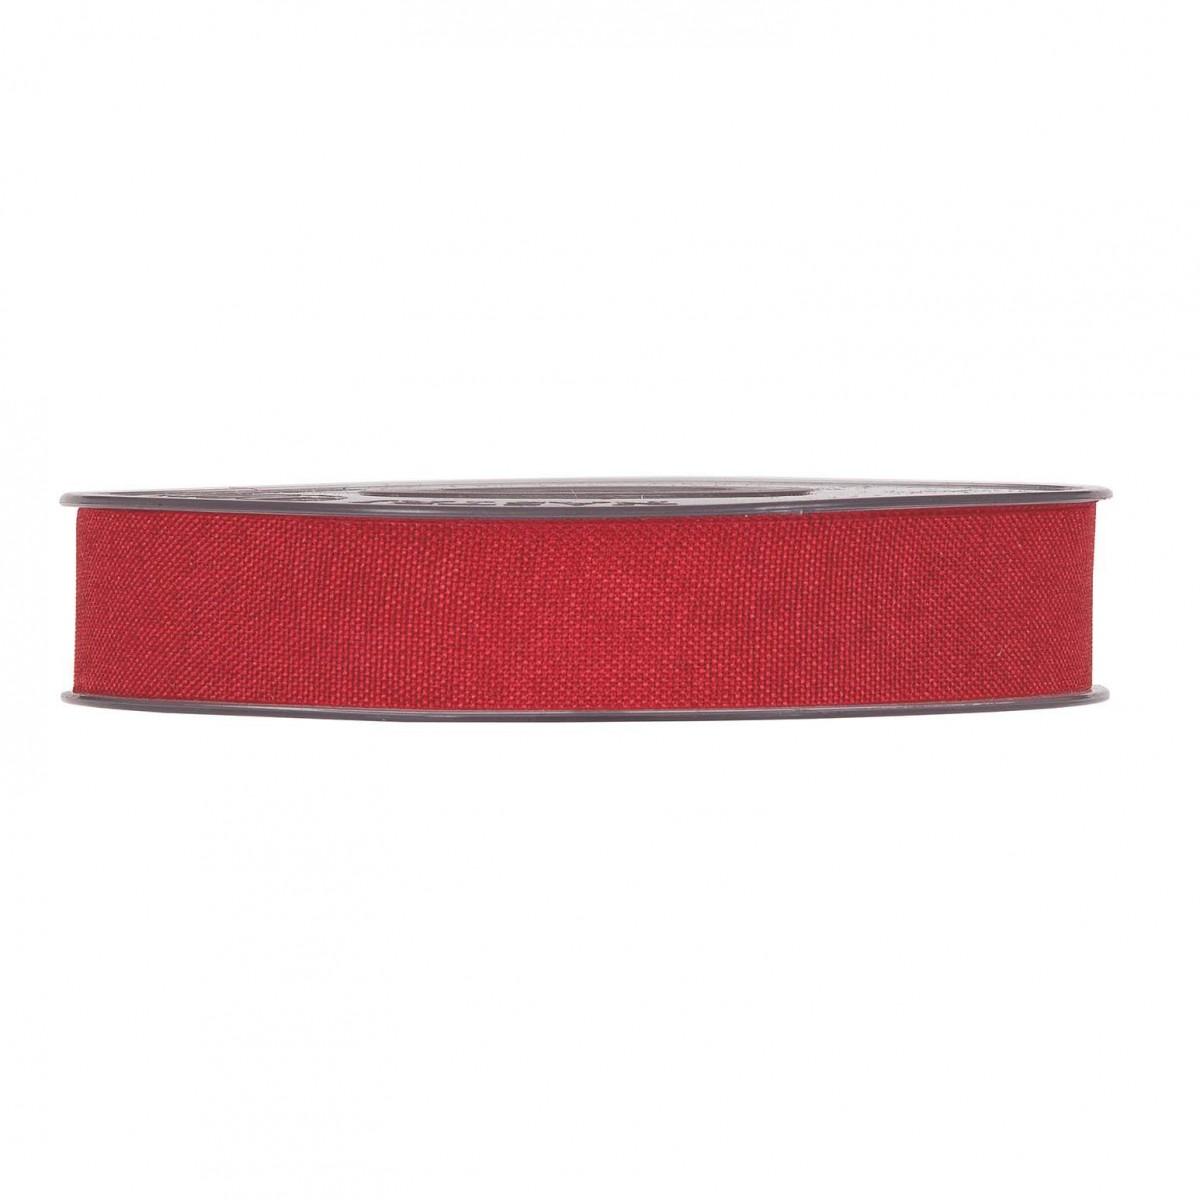 Nastro Jonny mm 15 x 20 mt rosso